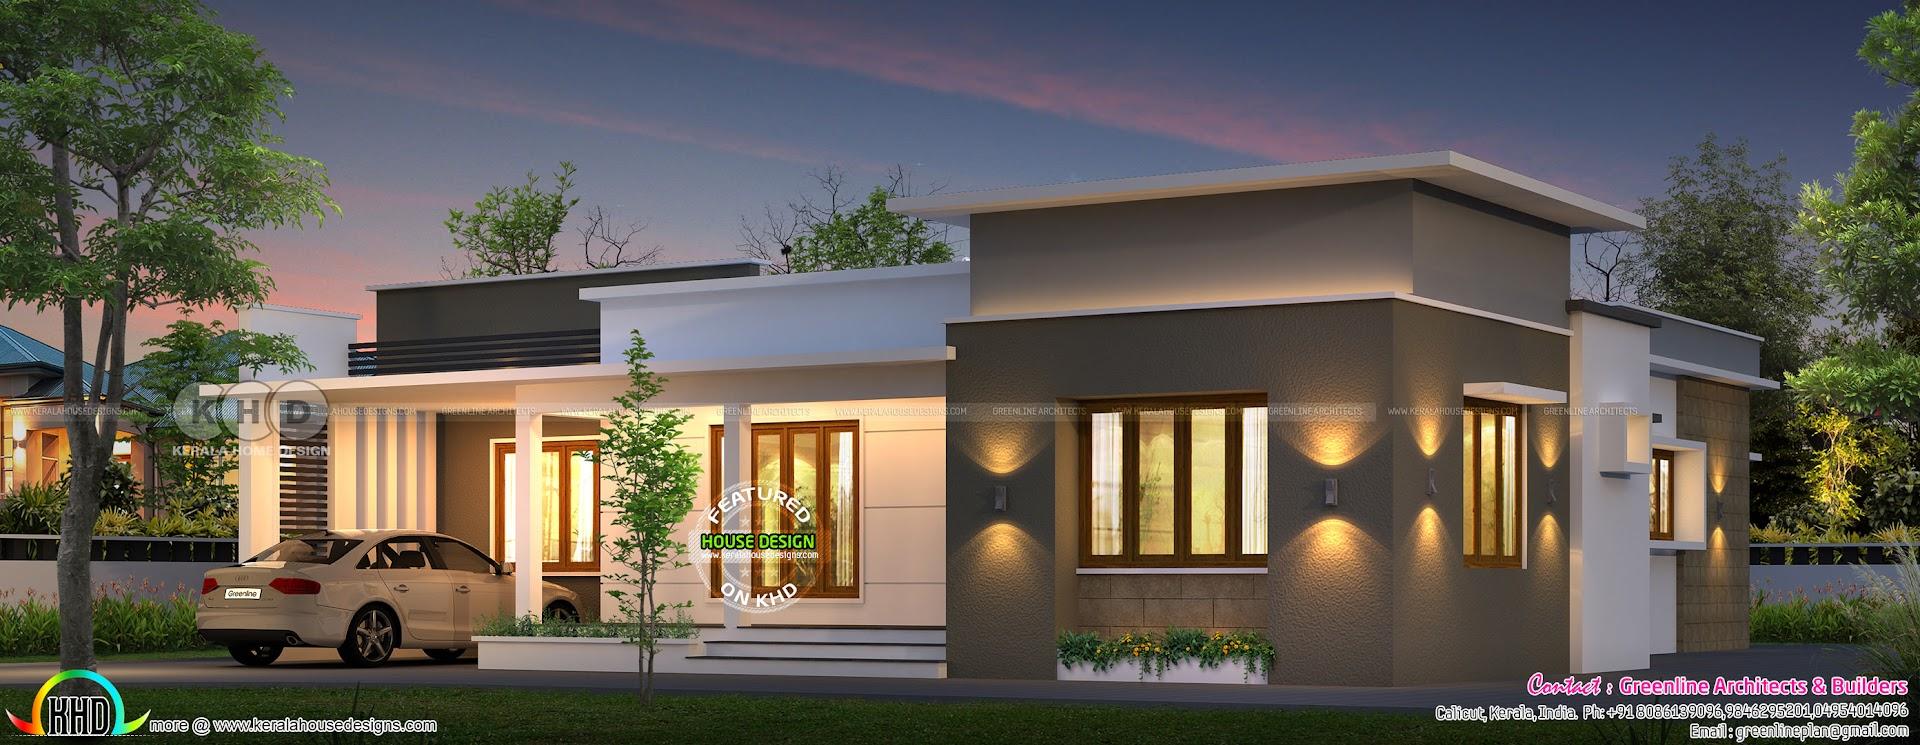 1500 sq-ft Villa design plan by Greenline Architects ...